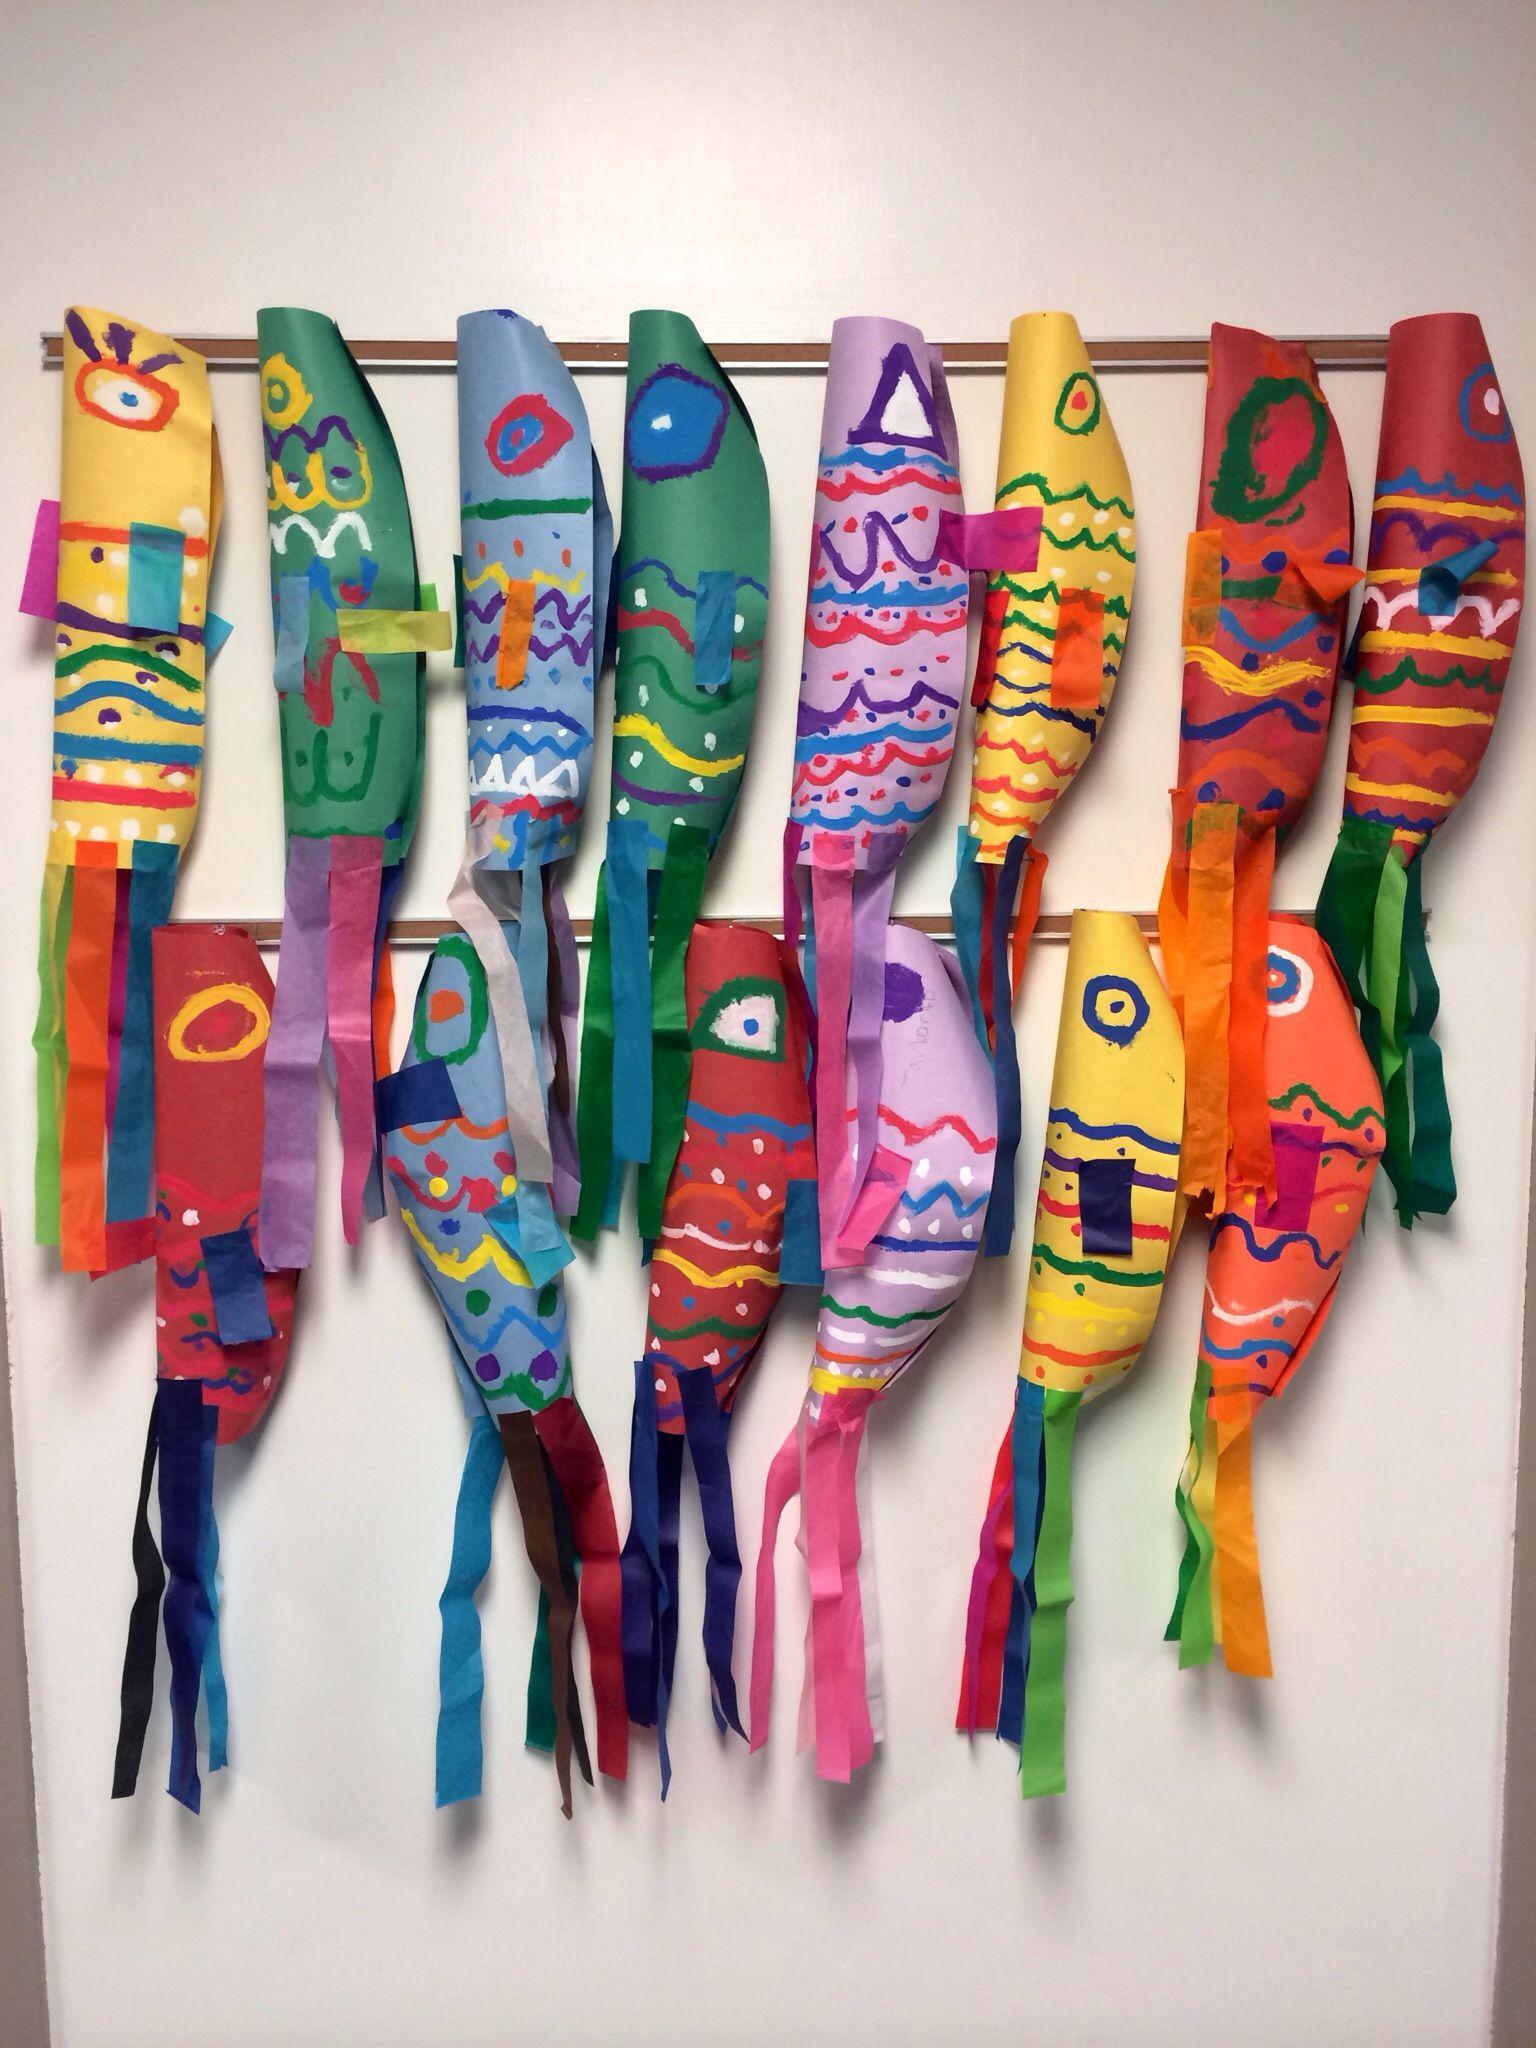 Elementary Art Project Japanese Koinobori Culture Carp Streamers Painting